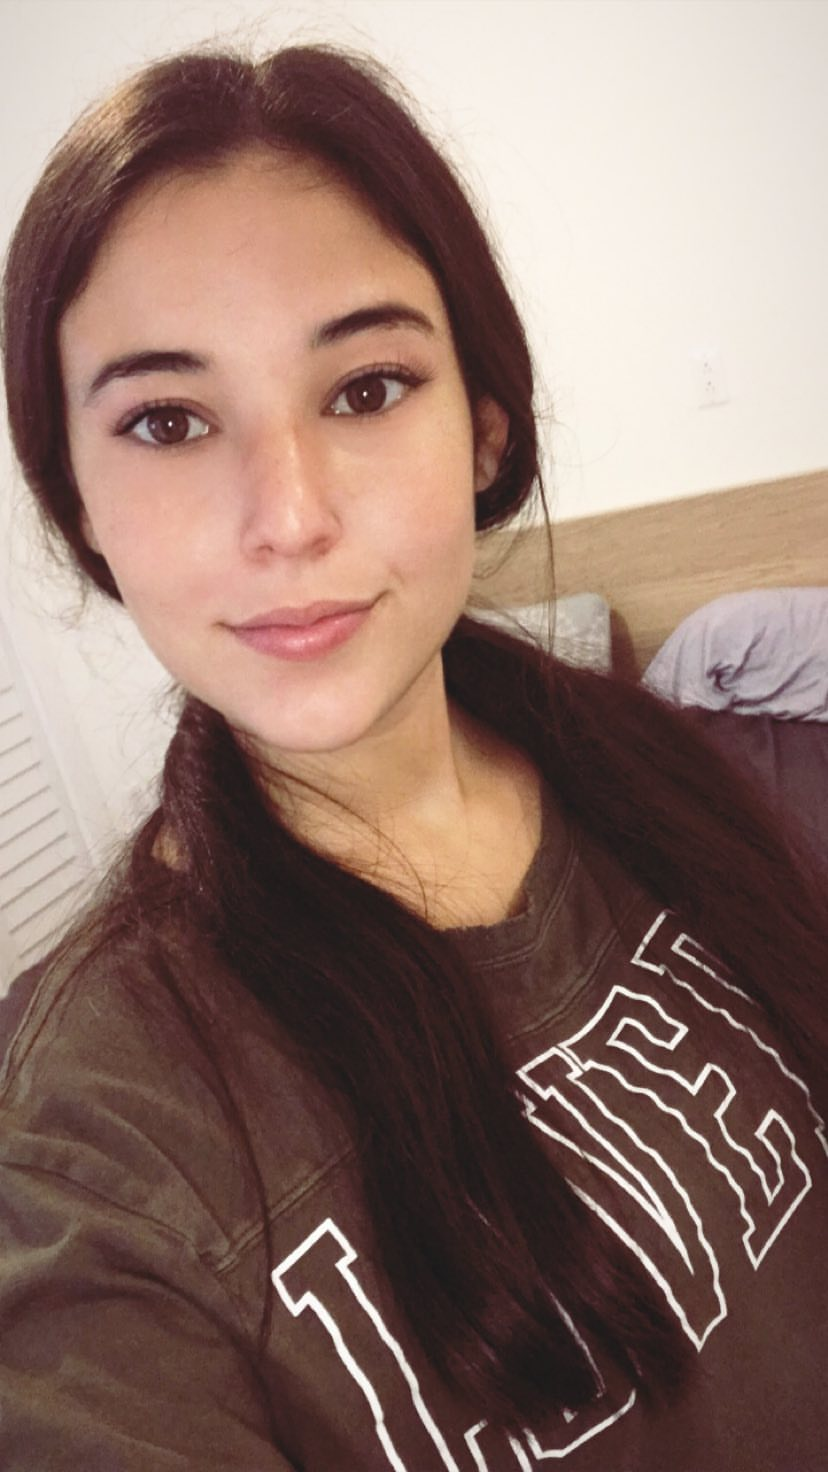 Angie Varona_scammerinfo_6